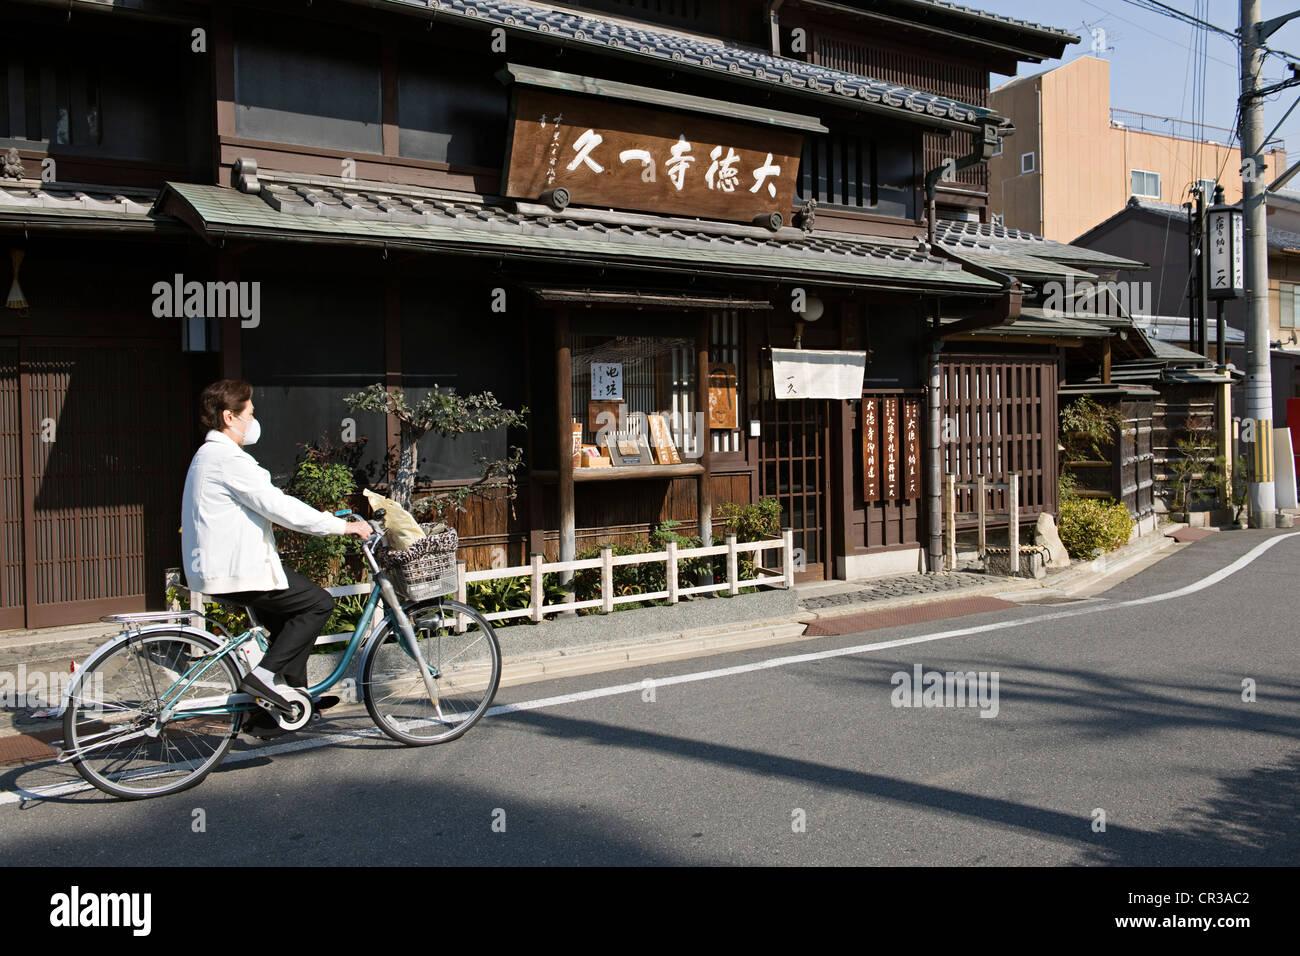 Japan, Honshu Island, Kinki Region, city of Kyoto, cyclist - Stock Image